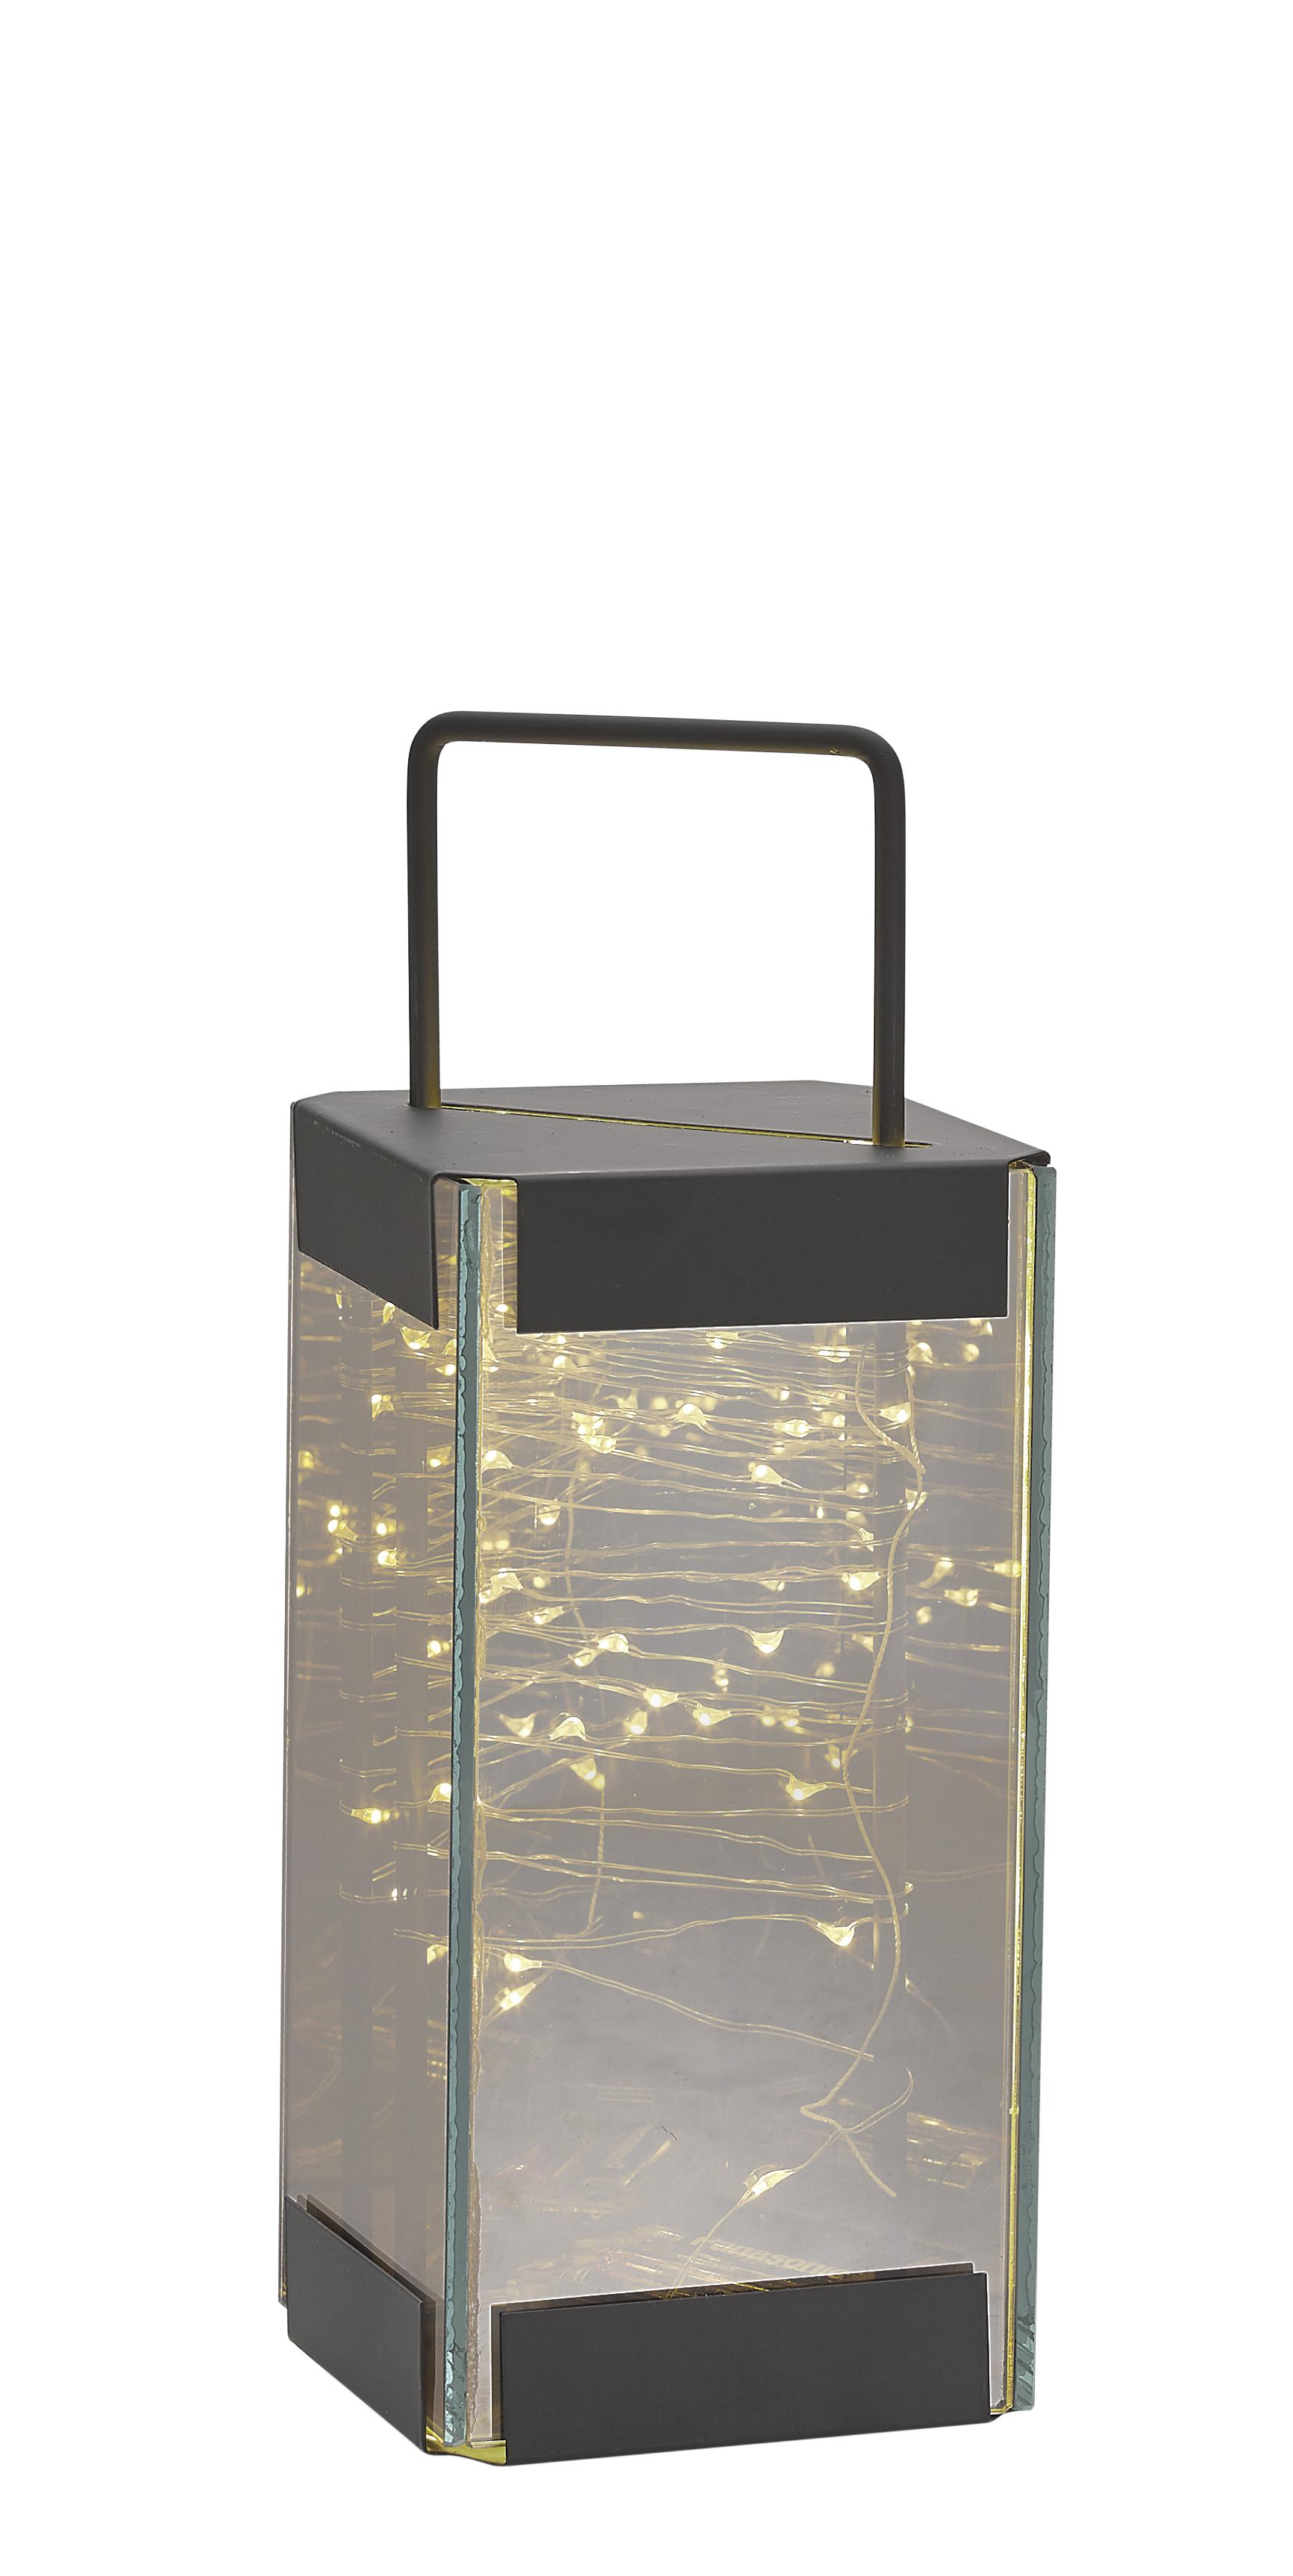 Image of   Villa Collection Lanterne m. LED lys m. timer. Røgfarvet, Sort. H 25,0cm, L 10,0cm, B 10,0cm